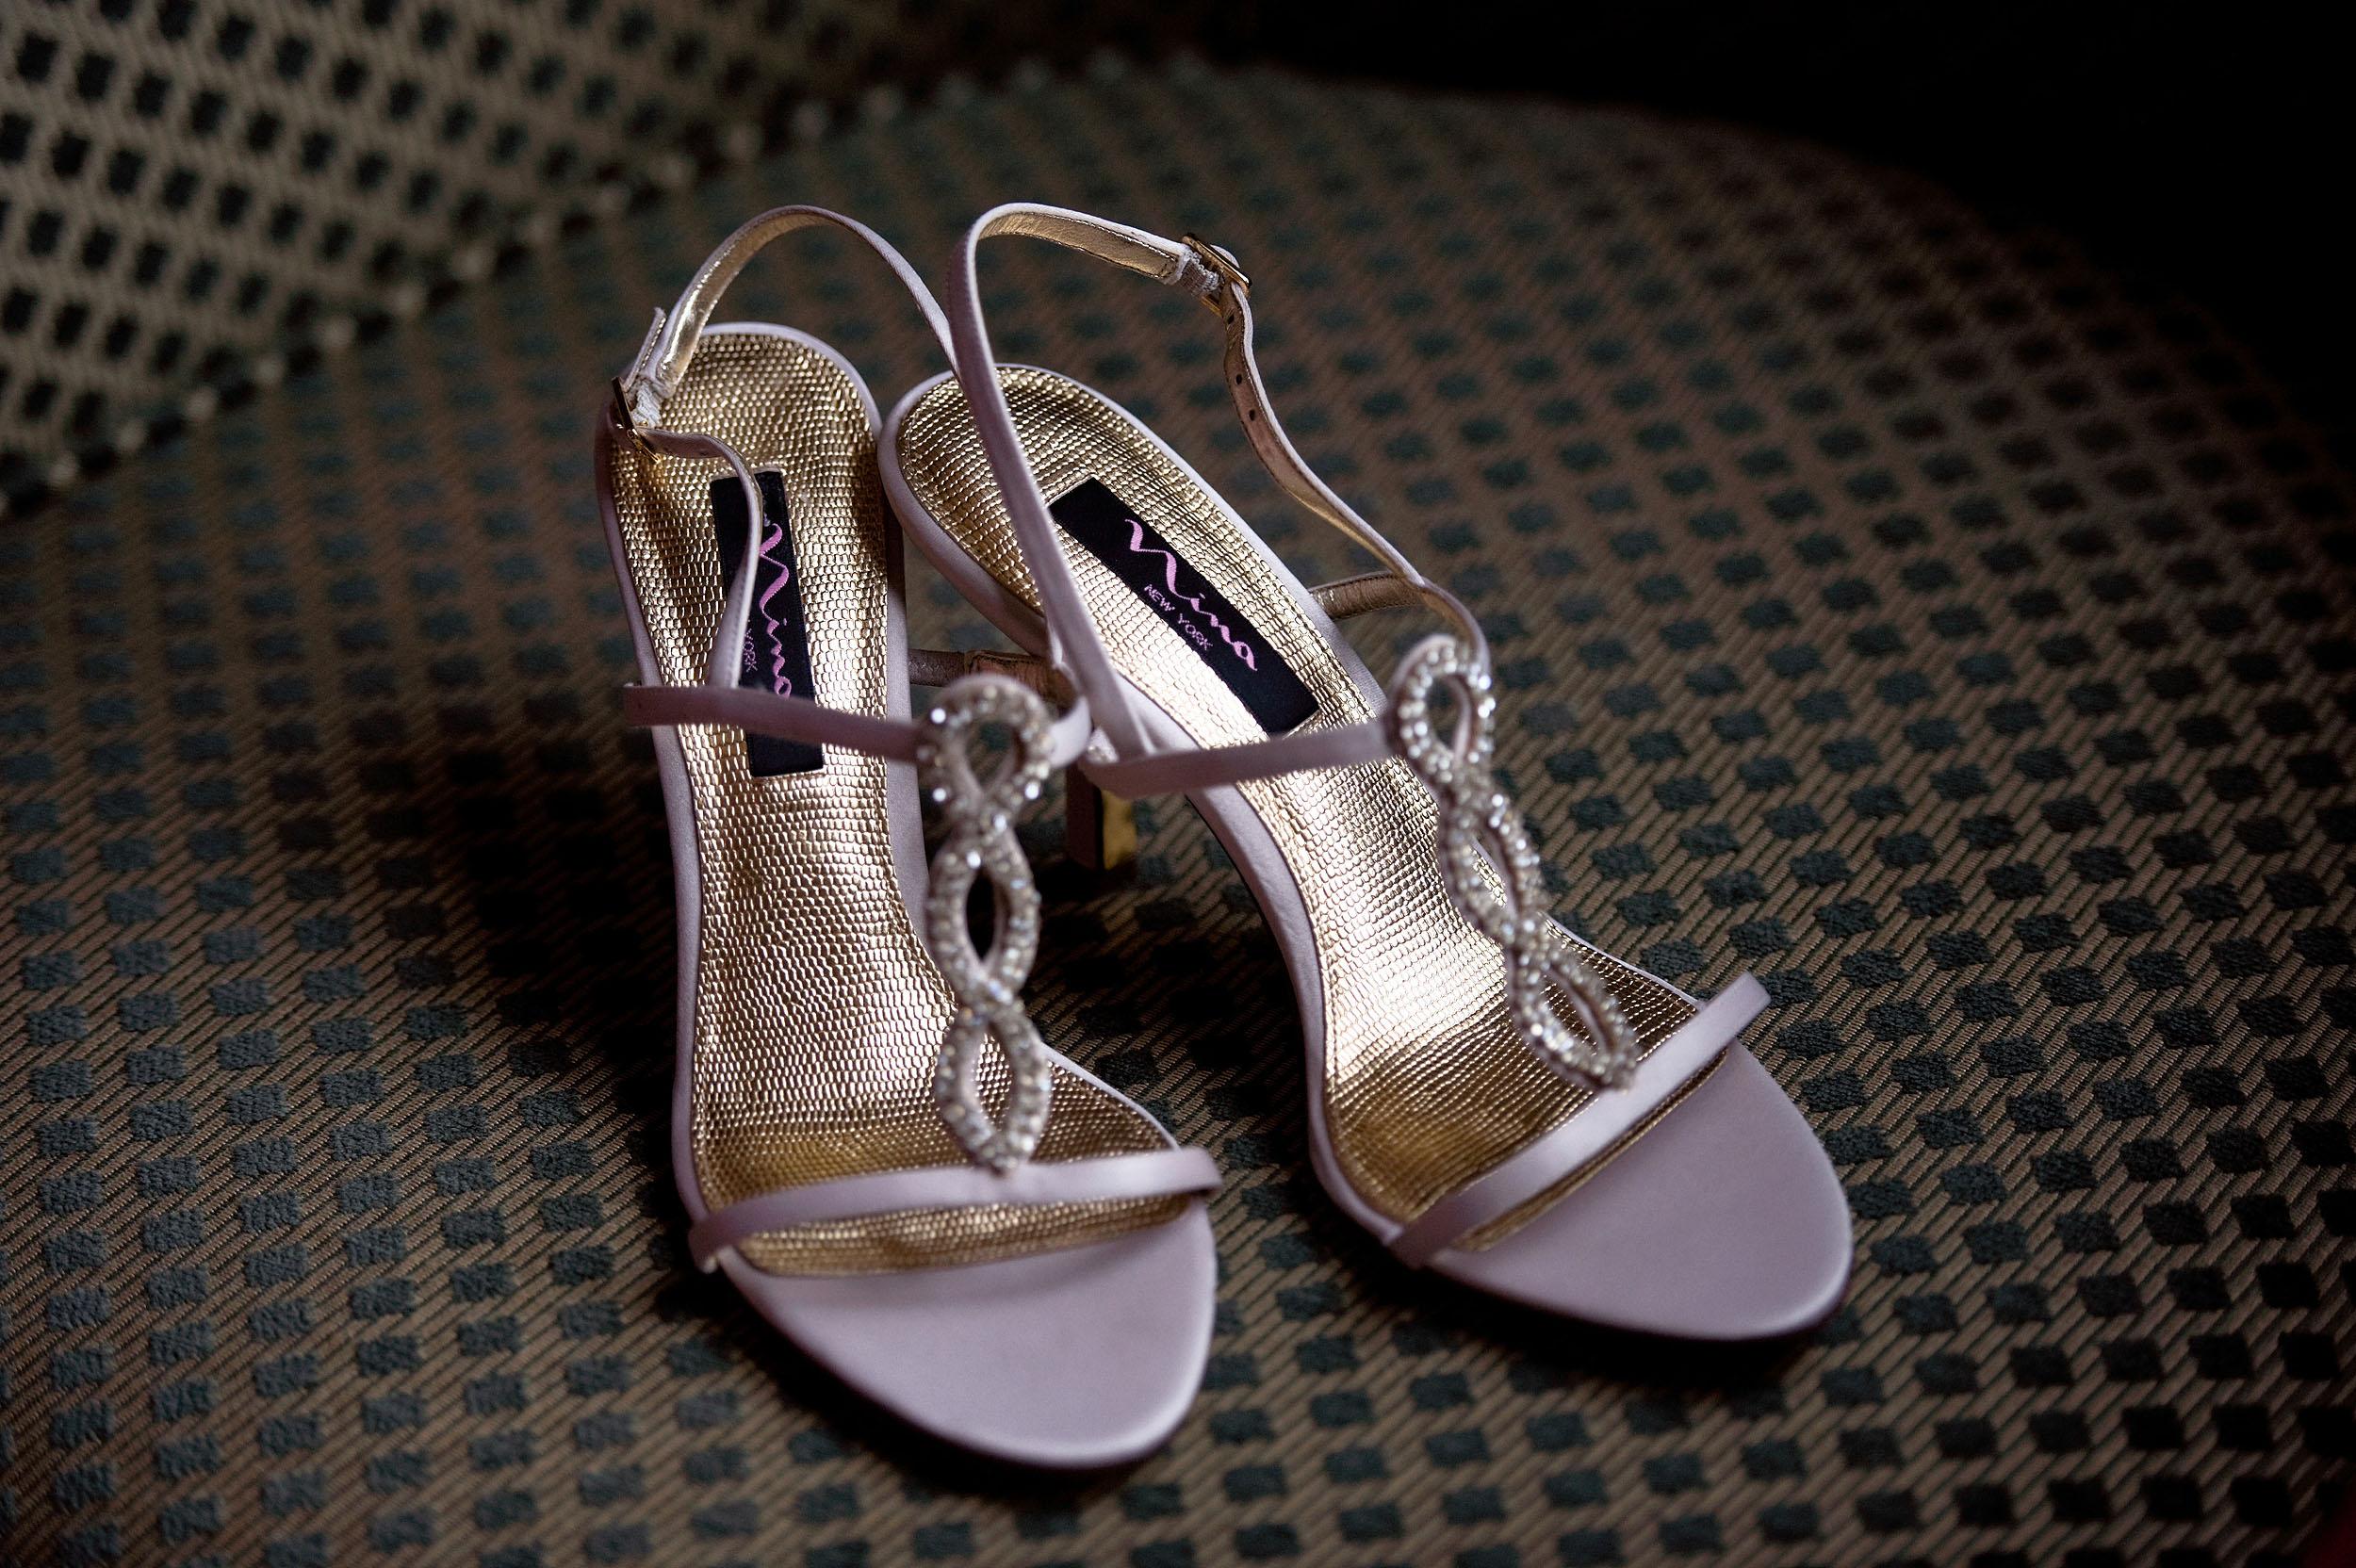 Bride's Nina New York wedding high heel shoes.